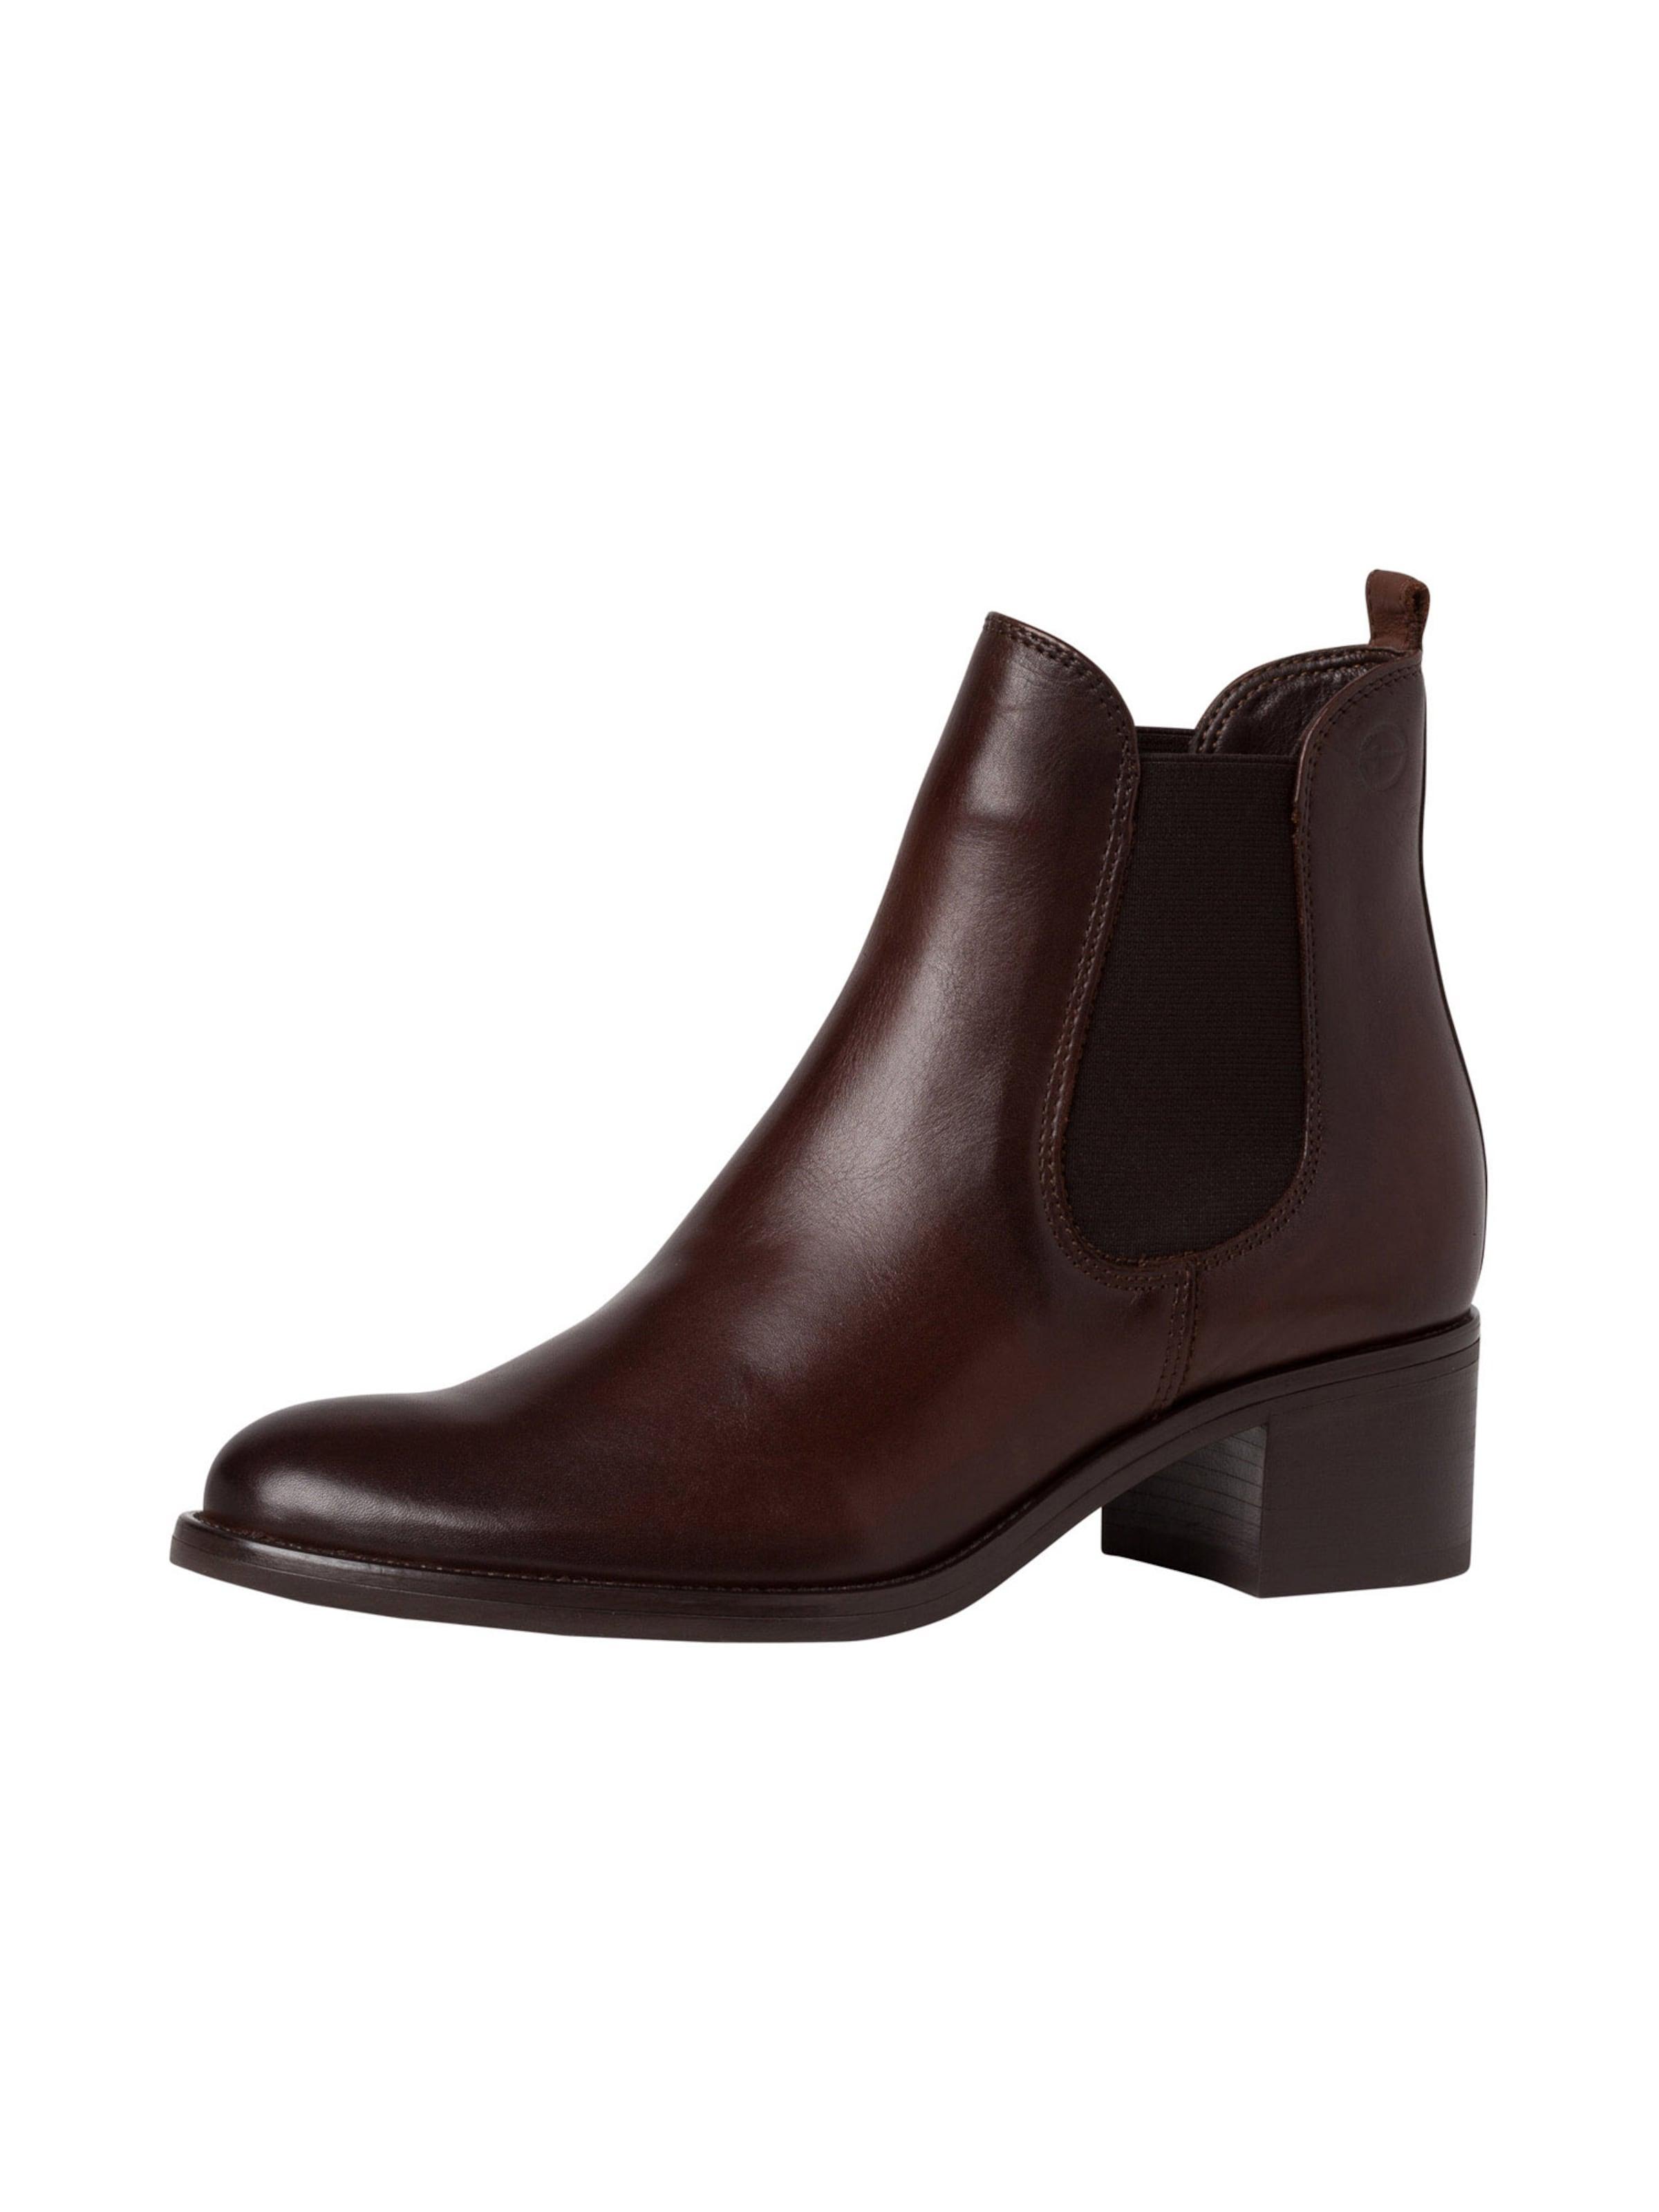 TAMARIS Chelsea boots i mörkbrun